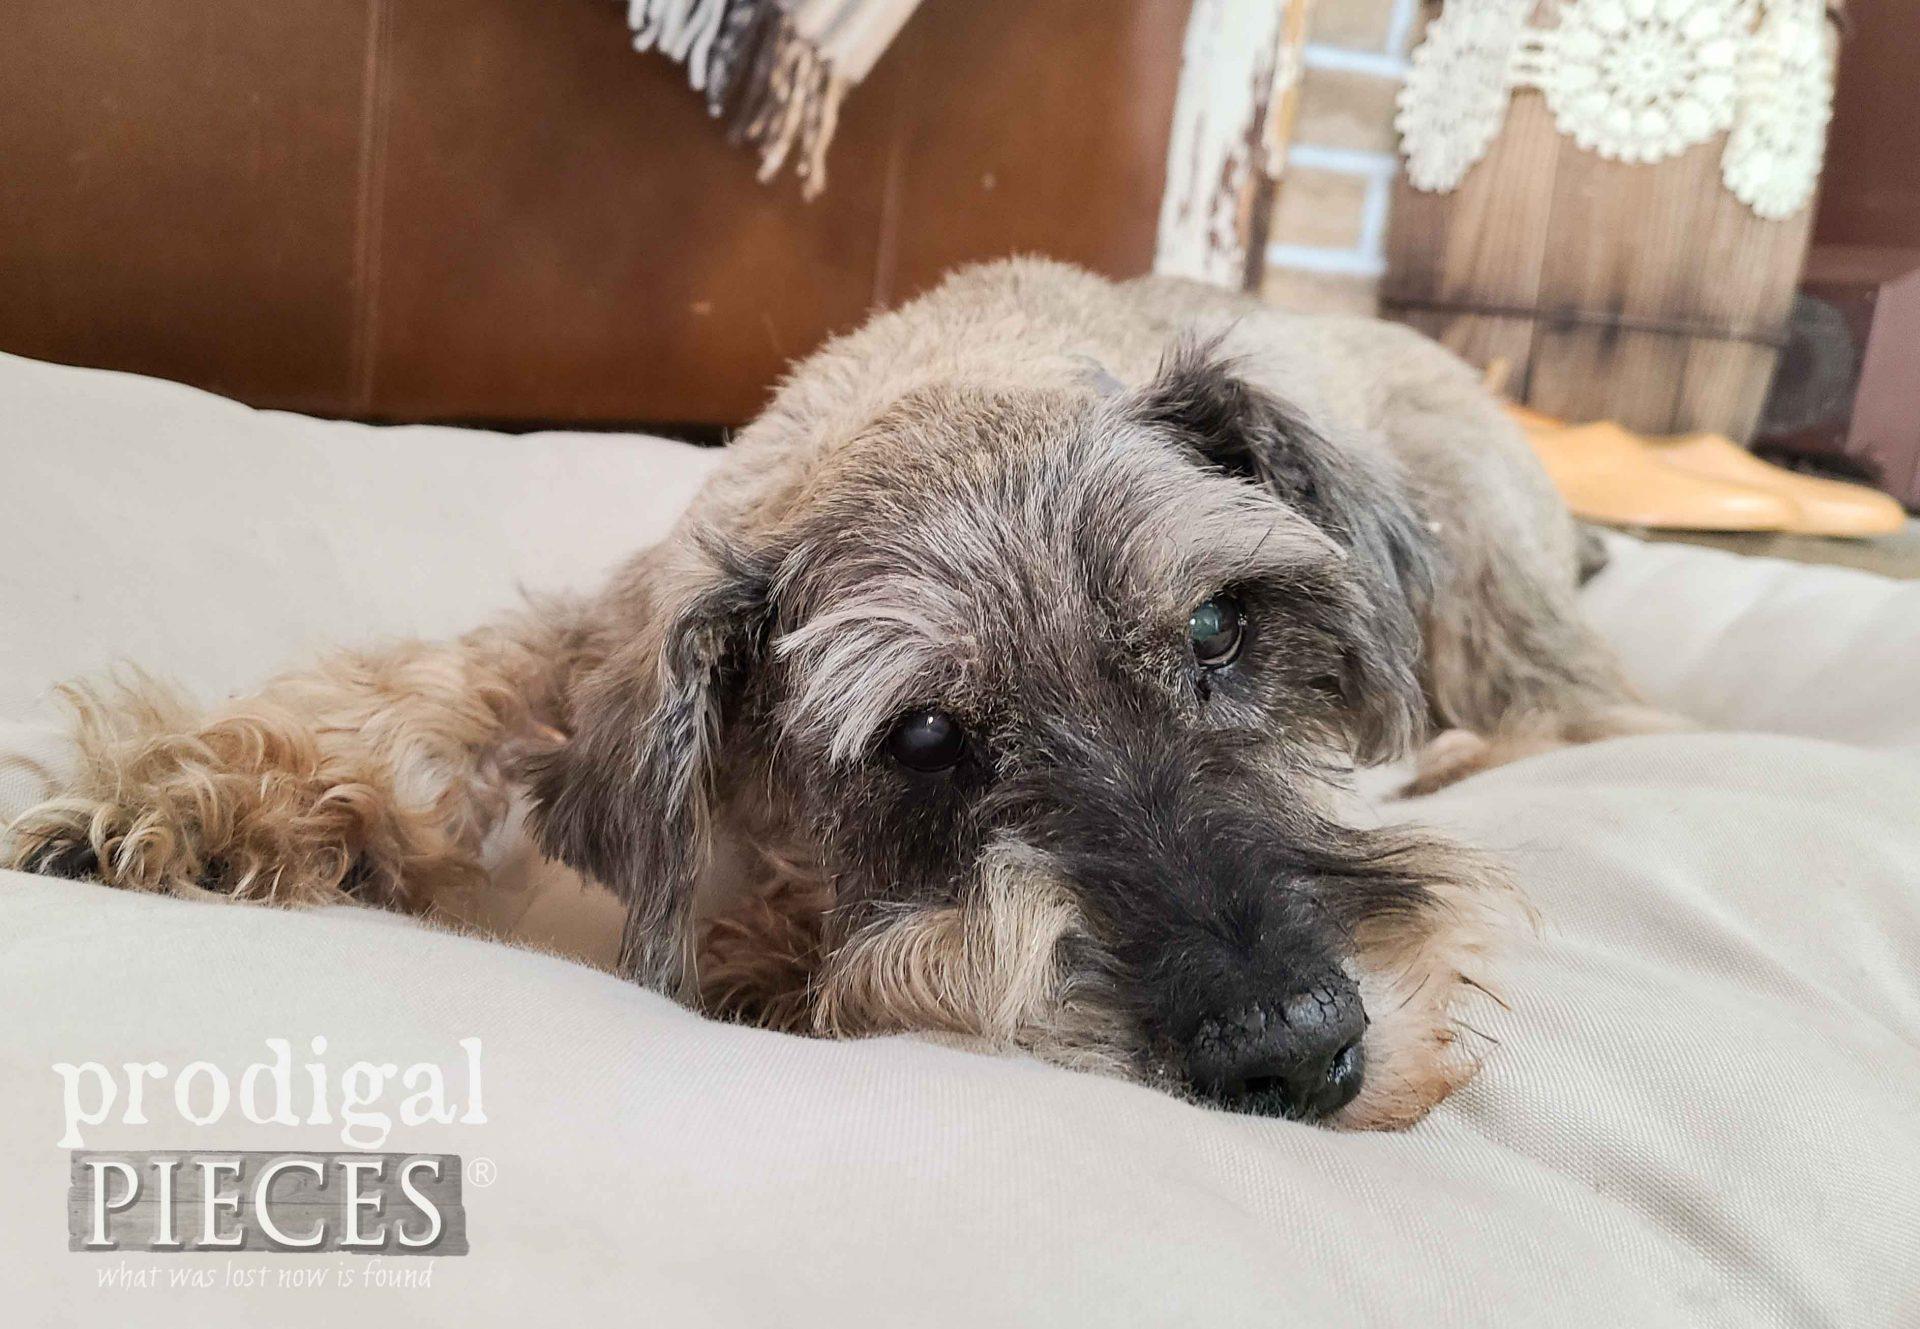 Senior Dog Miniature Schnauzer on Bed | Prodigal Pieces | prodigalpieces.com #prodigalpieces